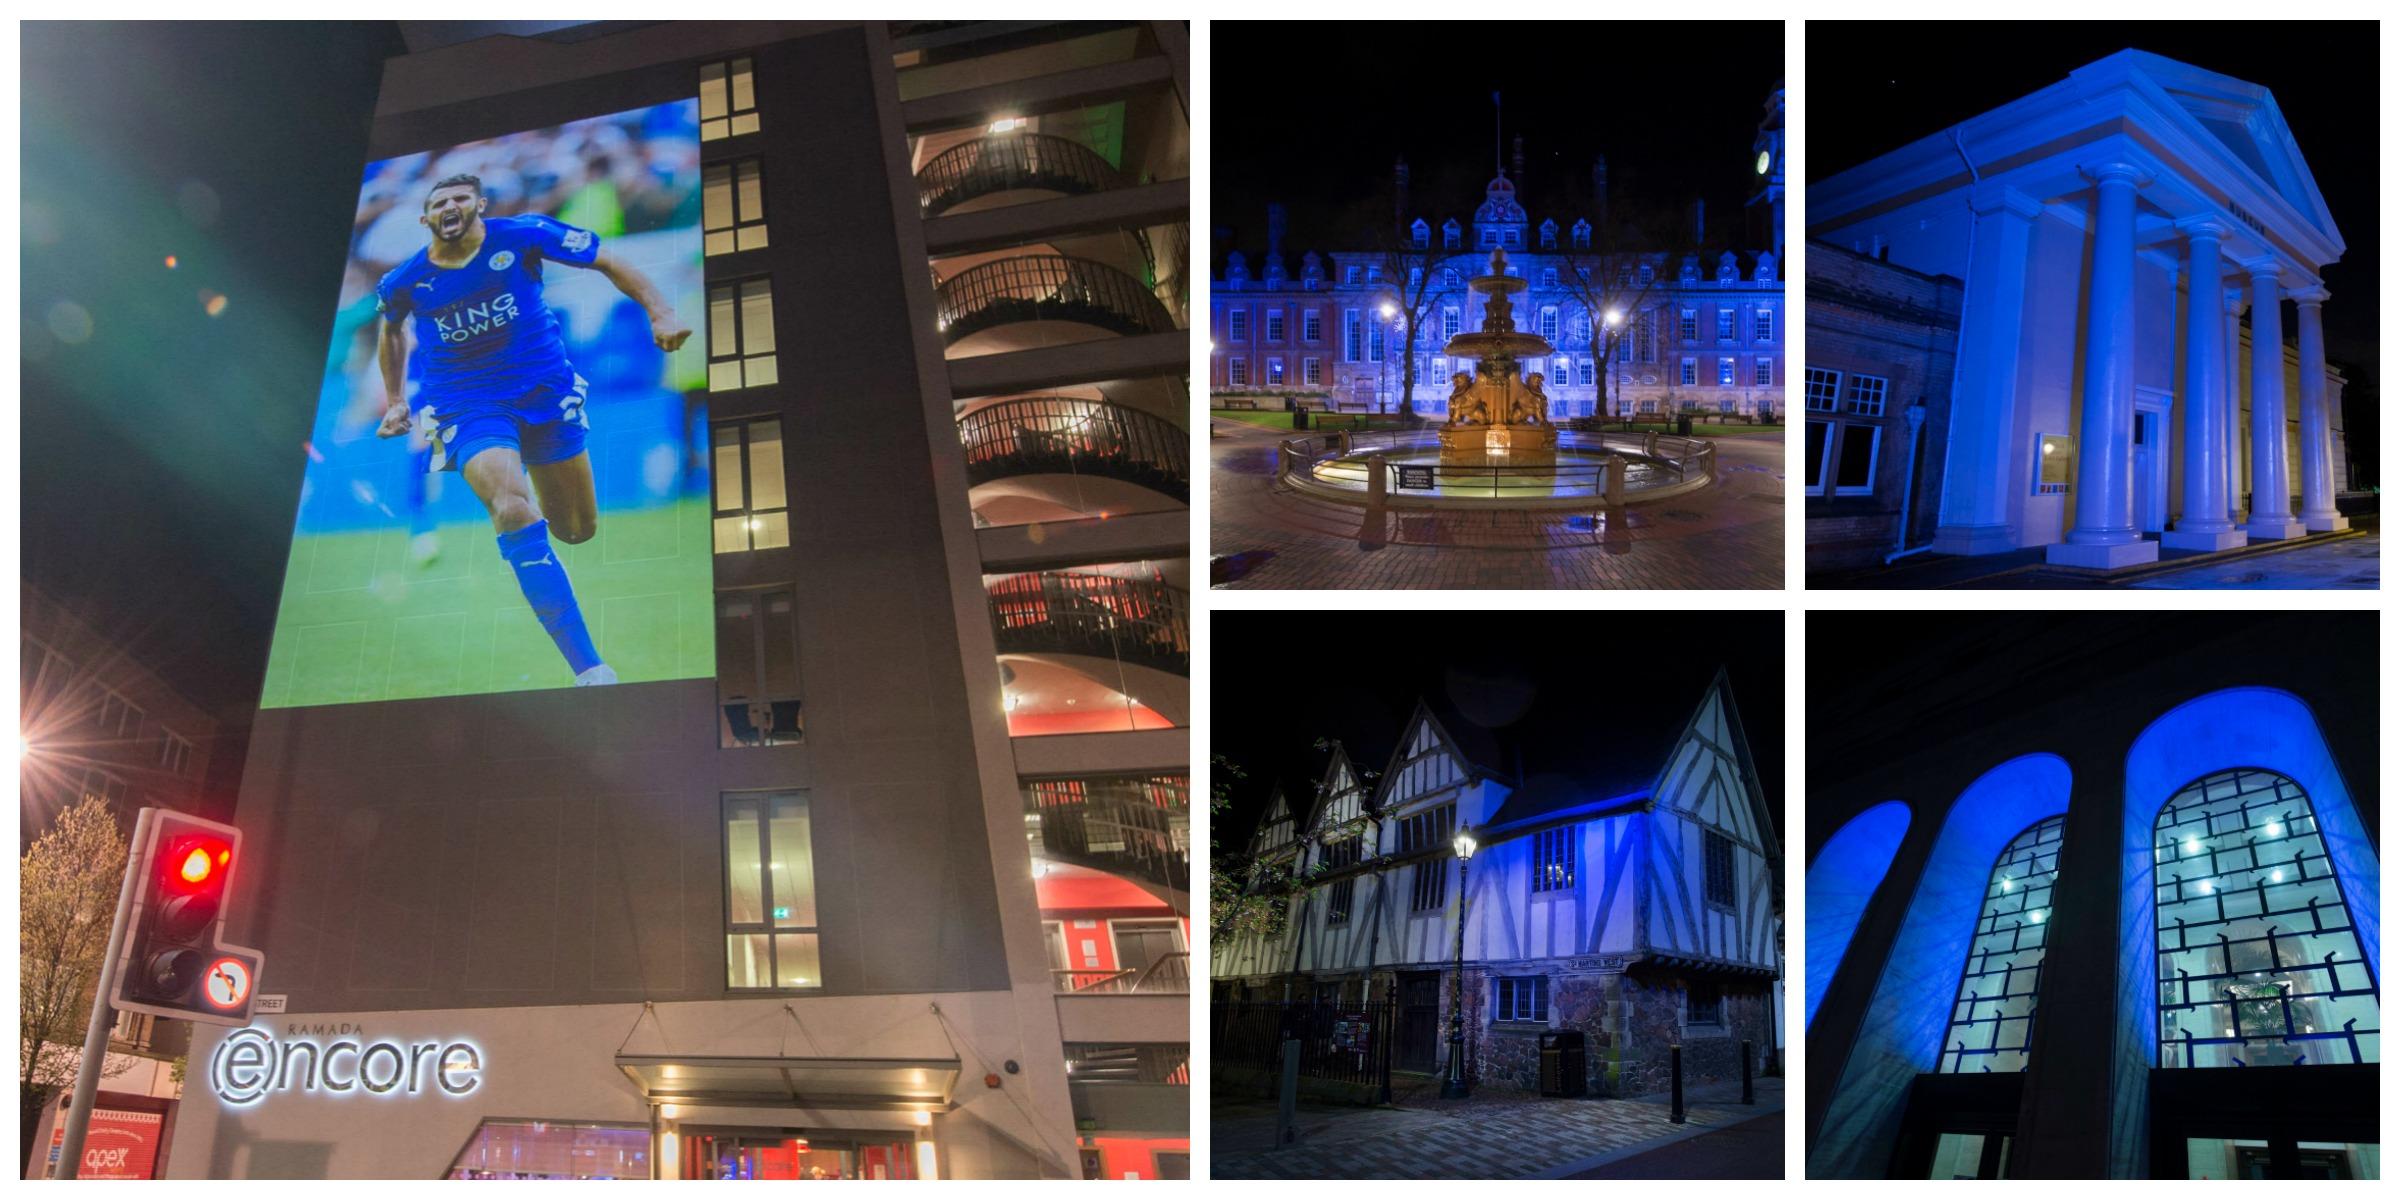 Leicester City Blue buildings